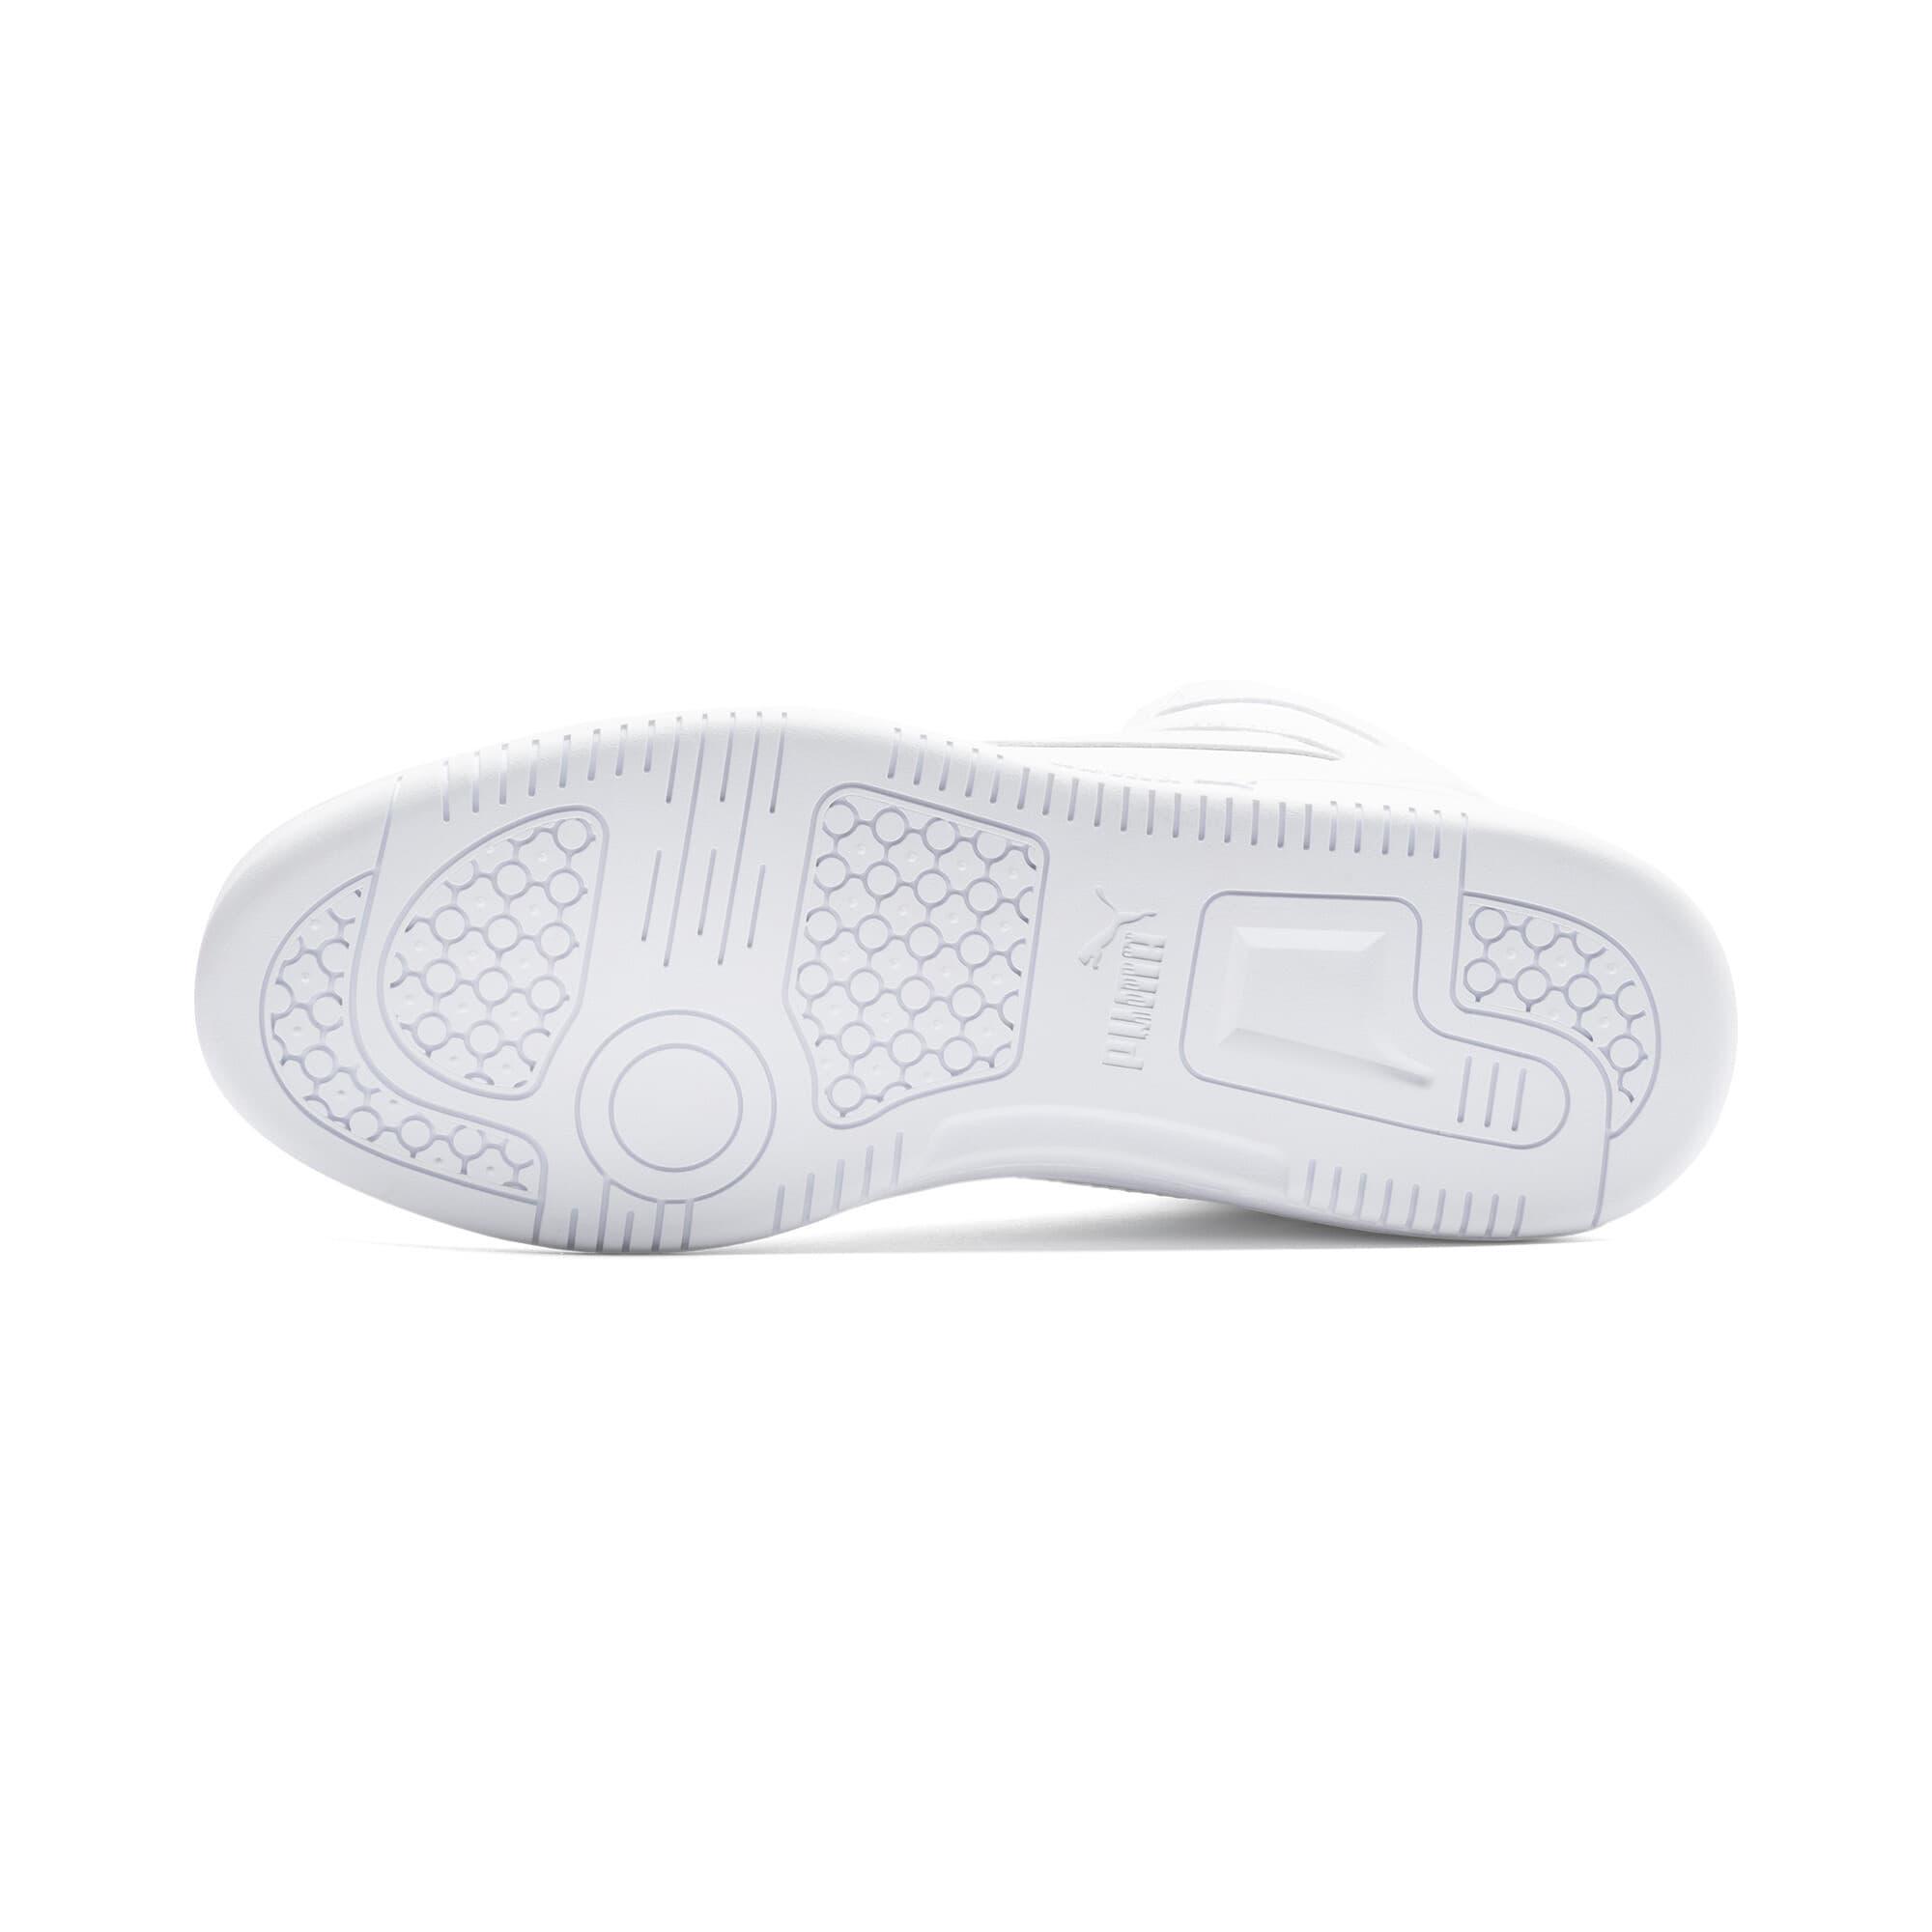 Thumbnail 4 of PUMA Rebound LayUp Sneakers, Puma White-Puma Black, medium